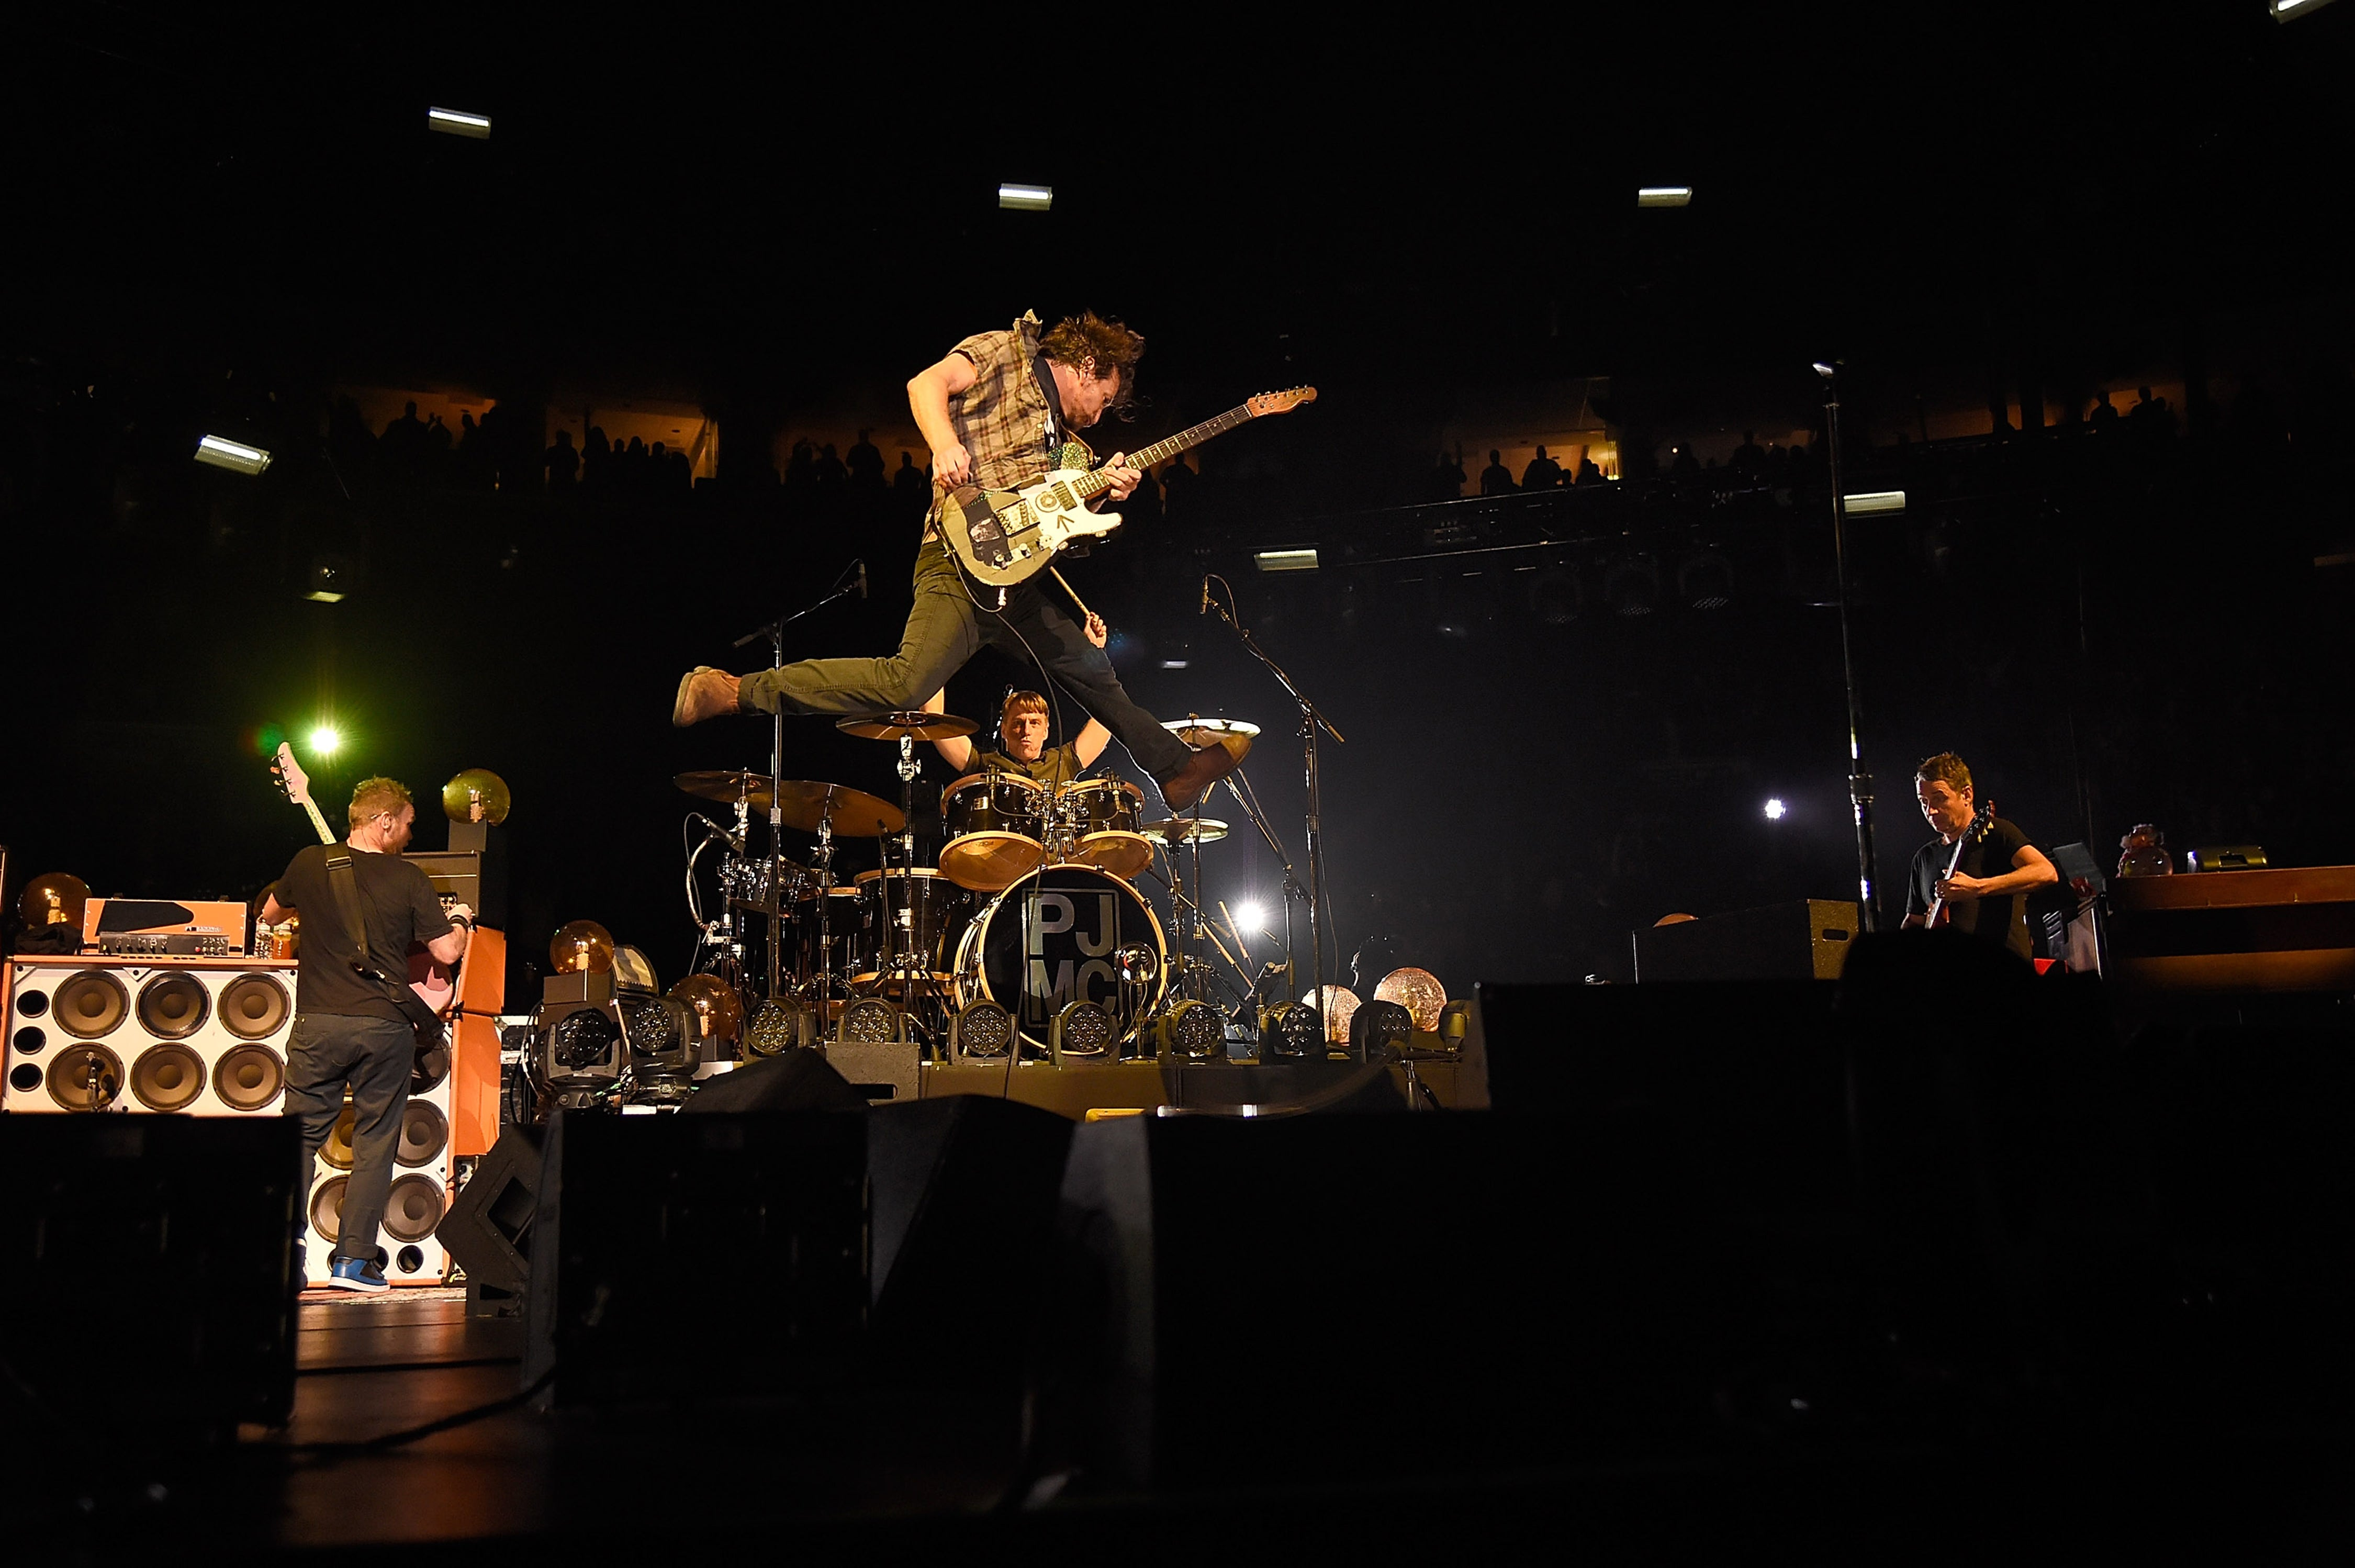 Pearl Jam to Stream Historic Philadelphia Show on Nugs.net Ahead of November General Election